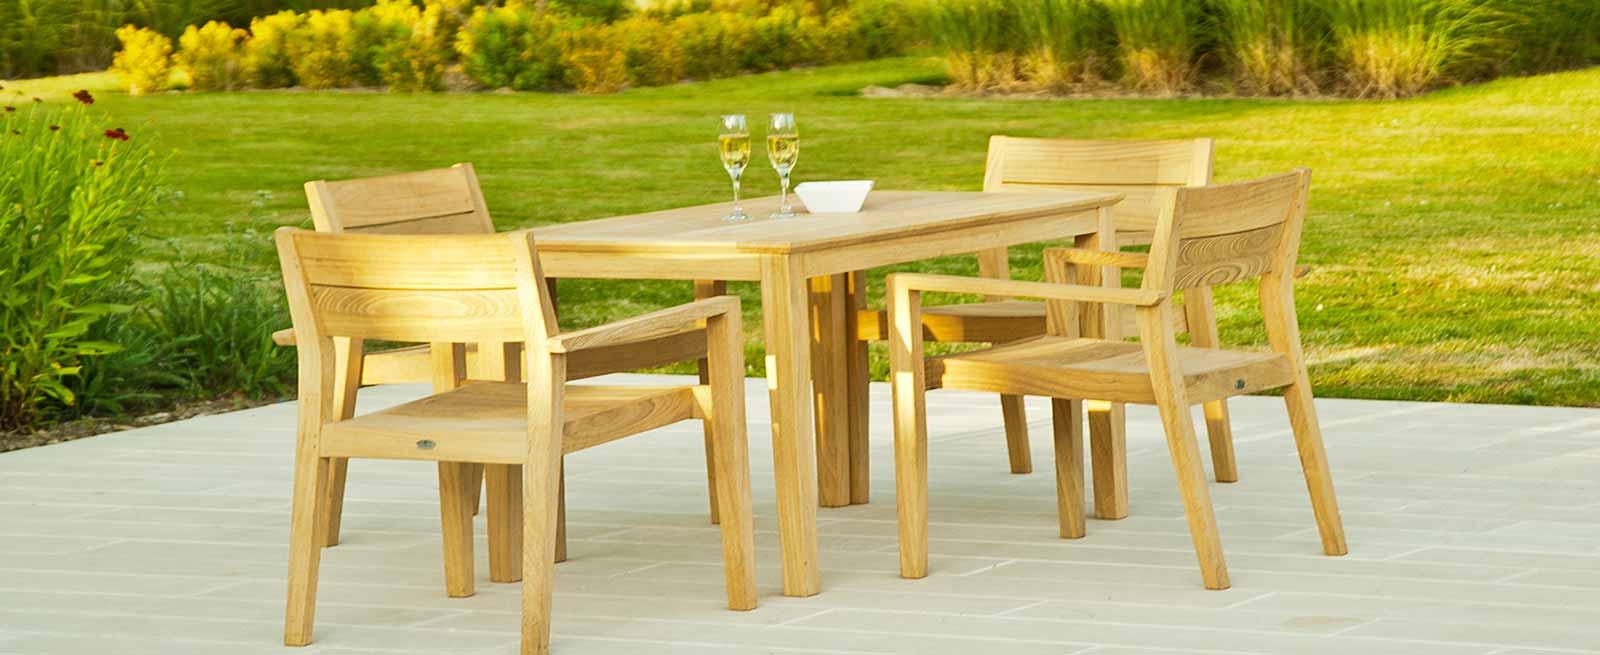 garden furnitures & patio